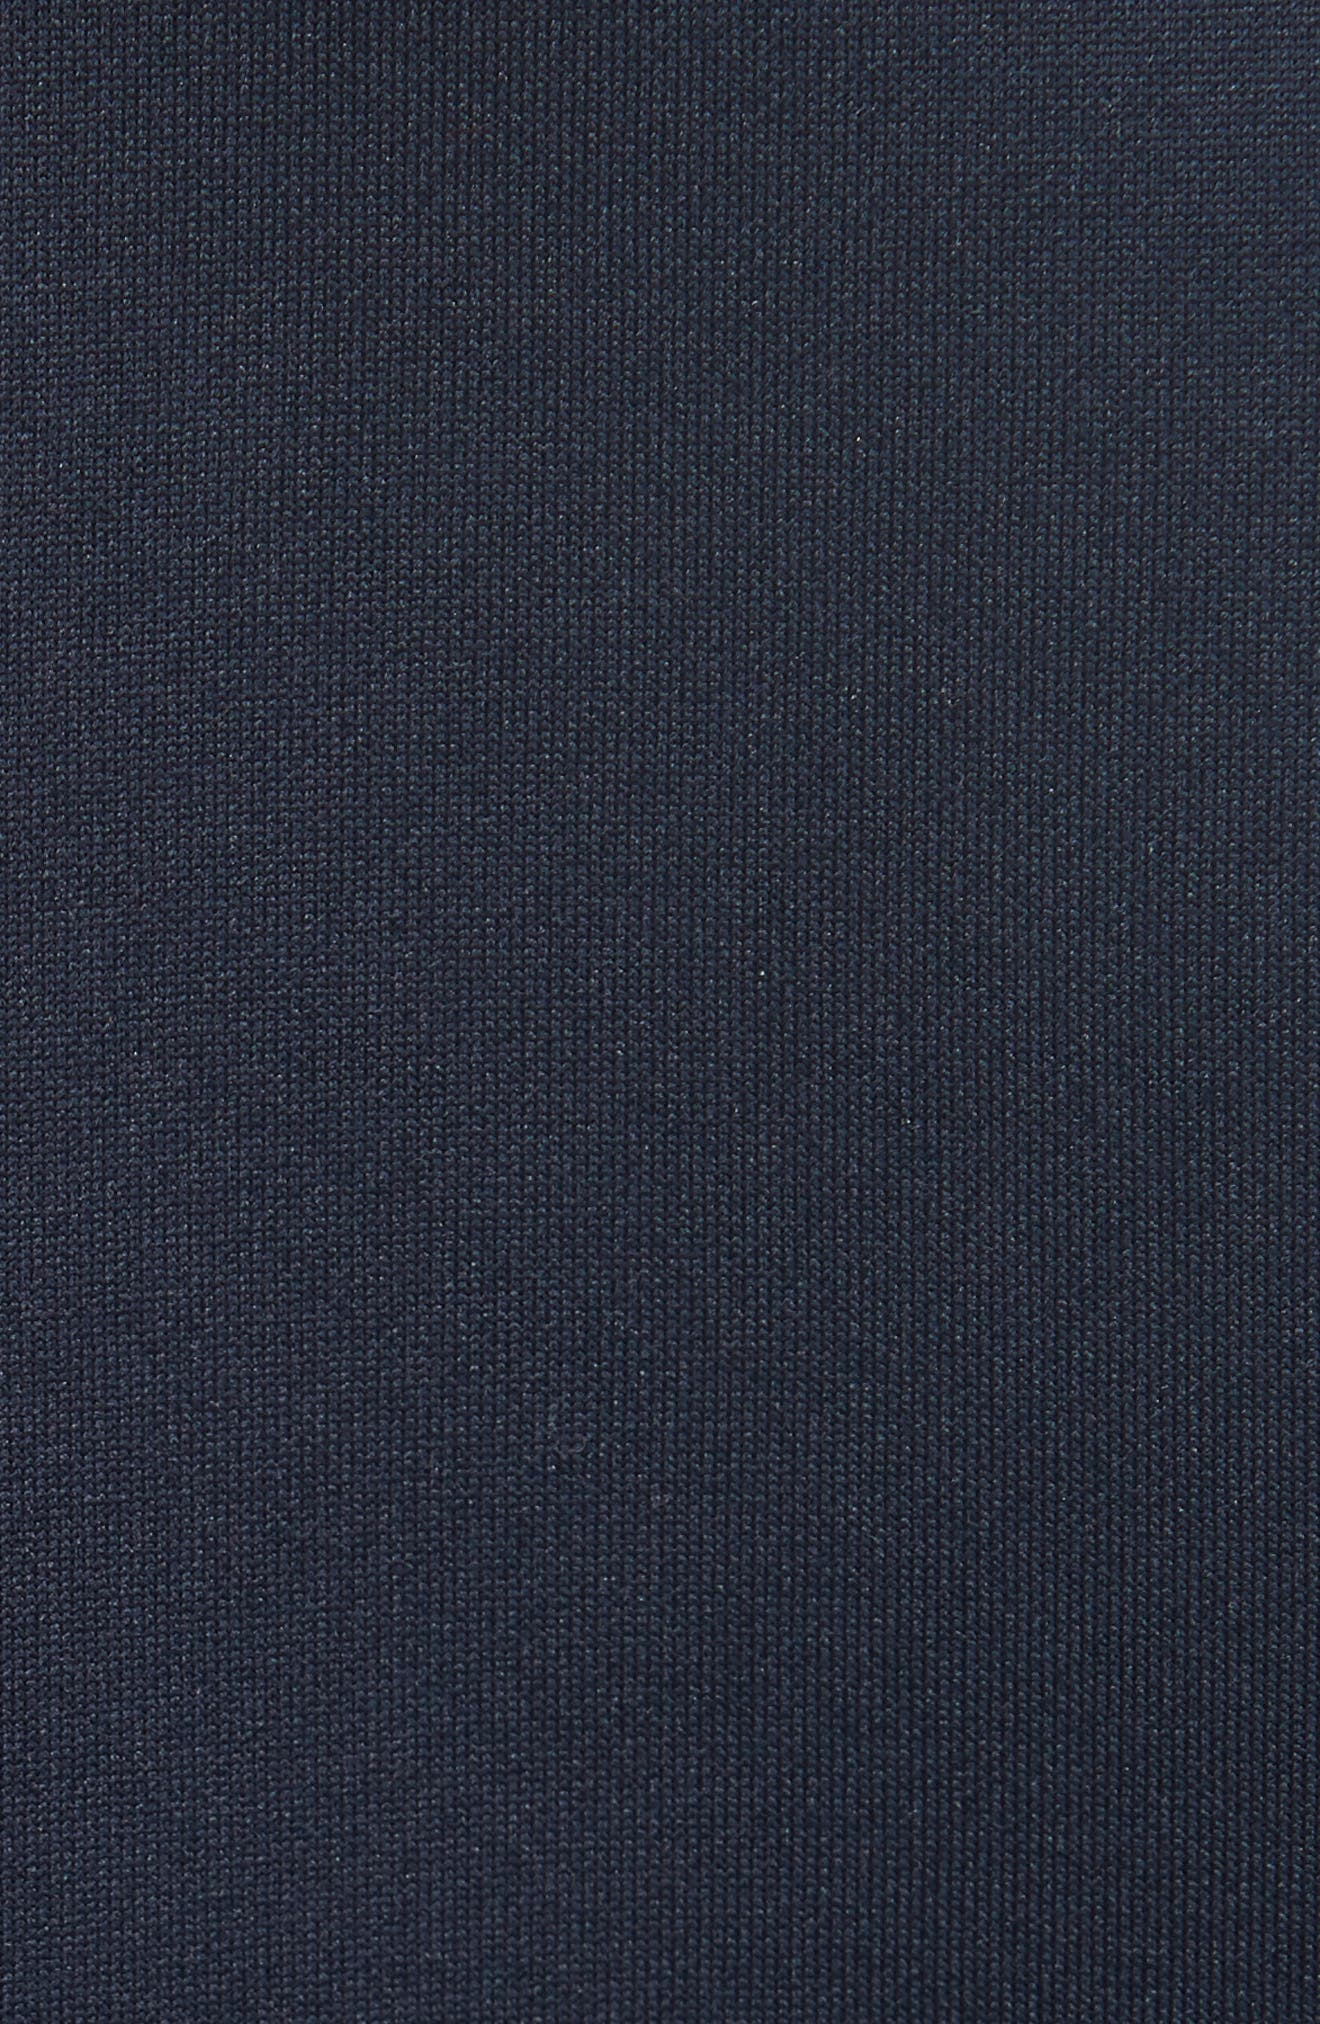 Spongy Track Jacket,                             Alternate thumbnail 7, color,                             PERSIAN BLUE